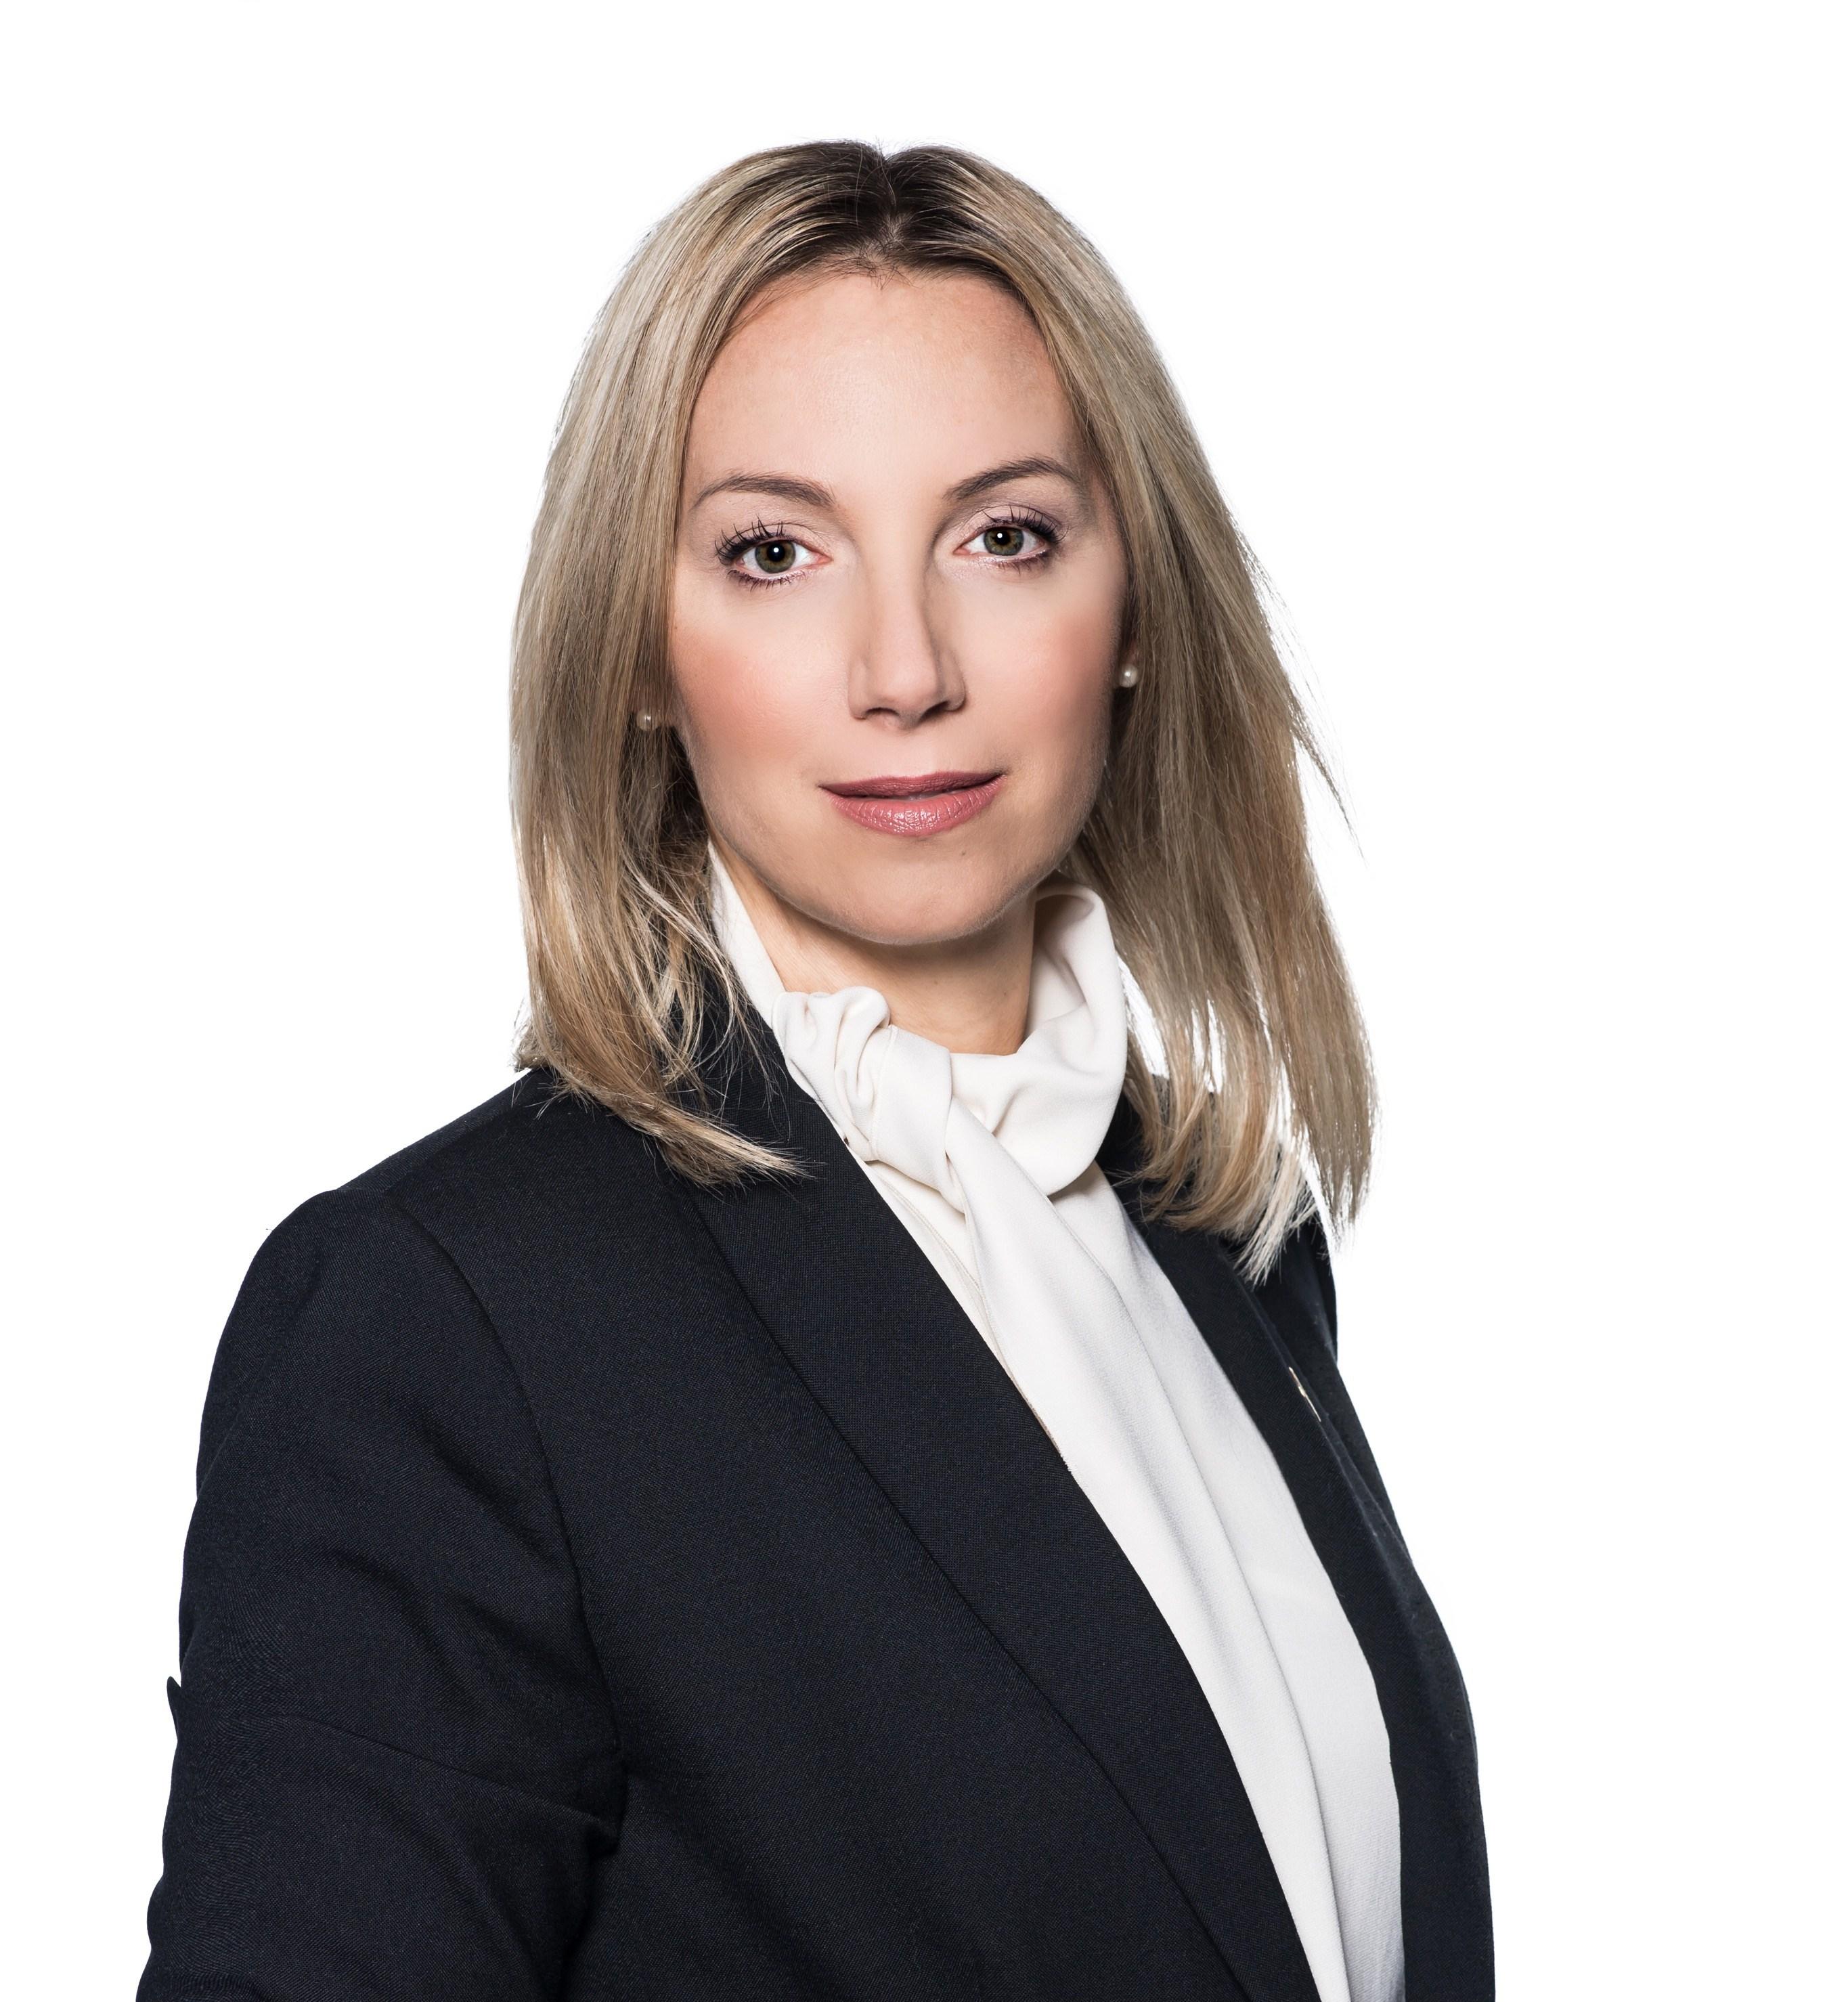 Britta Beier